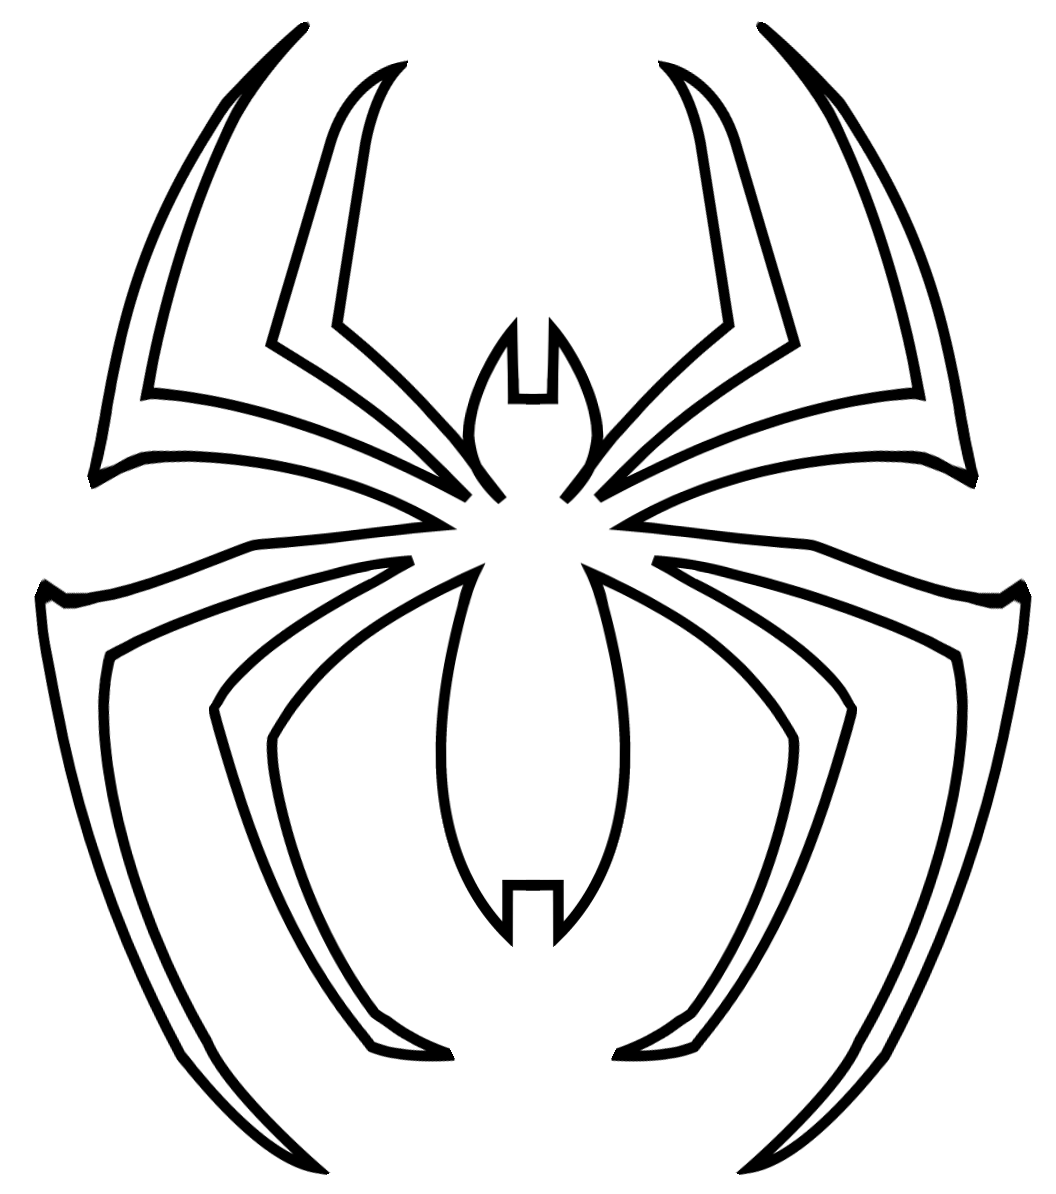 222154194099045296 besides Spiderman in addition Top 10 Attorney Law Logo Designs additionally Wonderland Logo 252210579 further Panda. on amazing logos